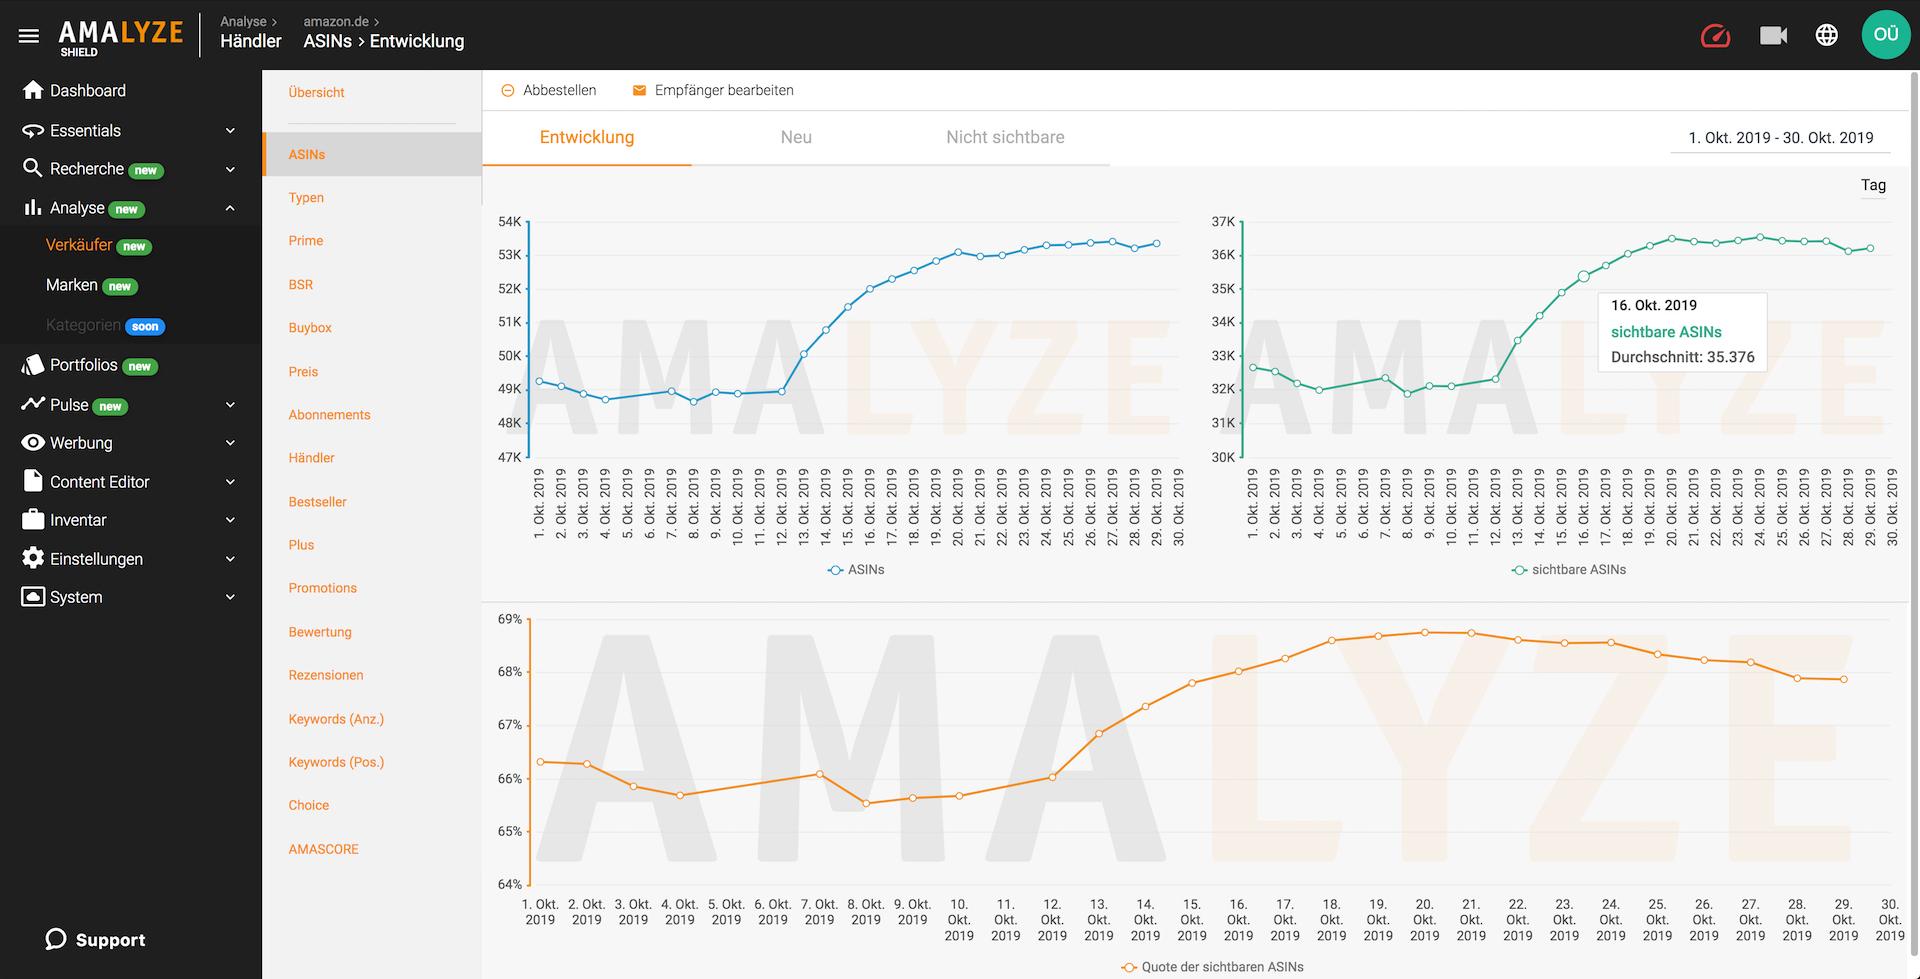 Amazon Tool AMALYZE_Analyse Modul_Seller Portfolio ASIN Übersicht